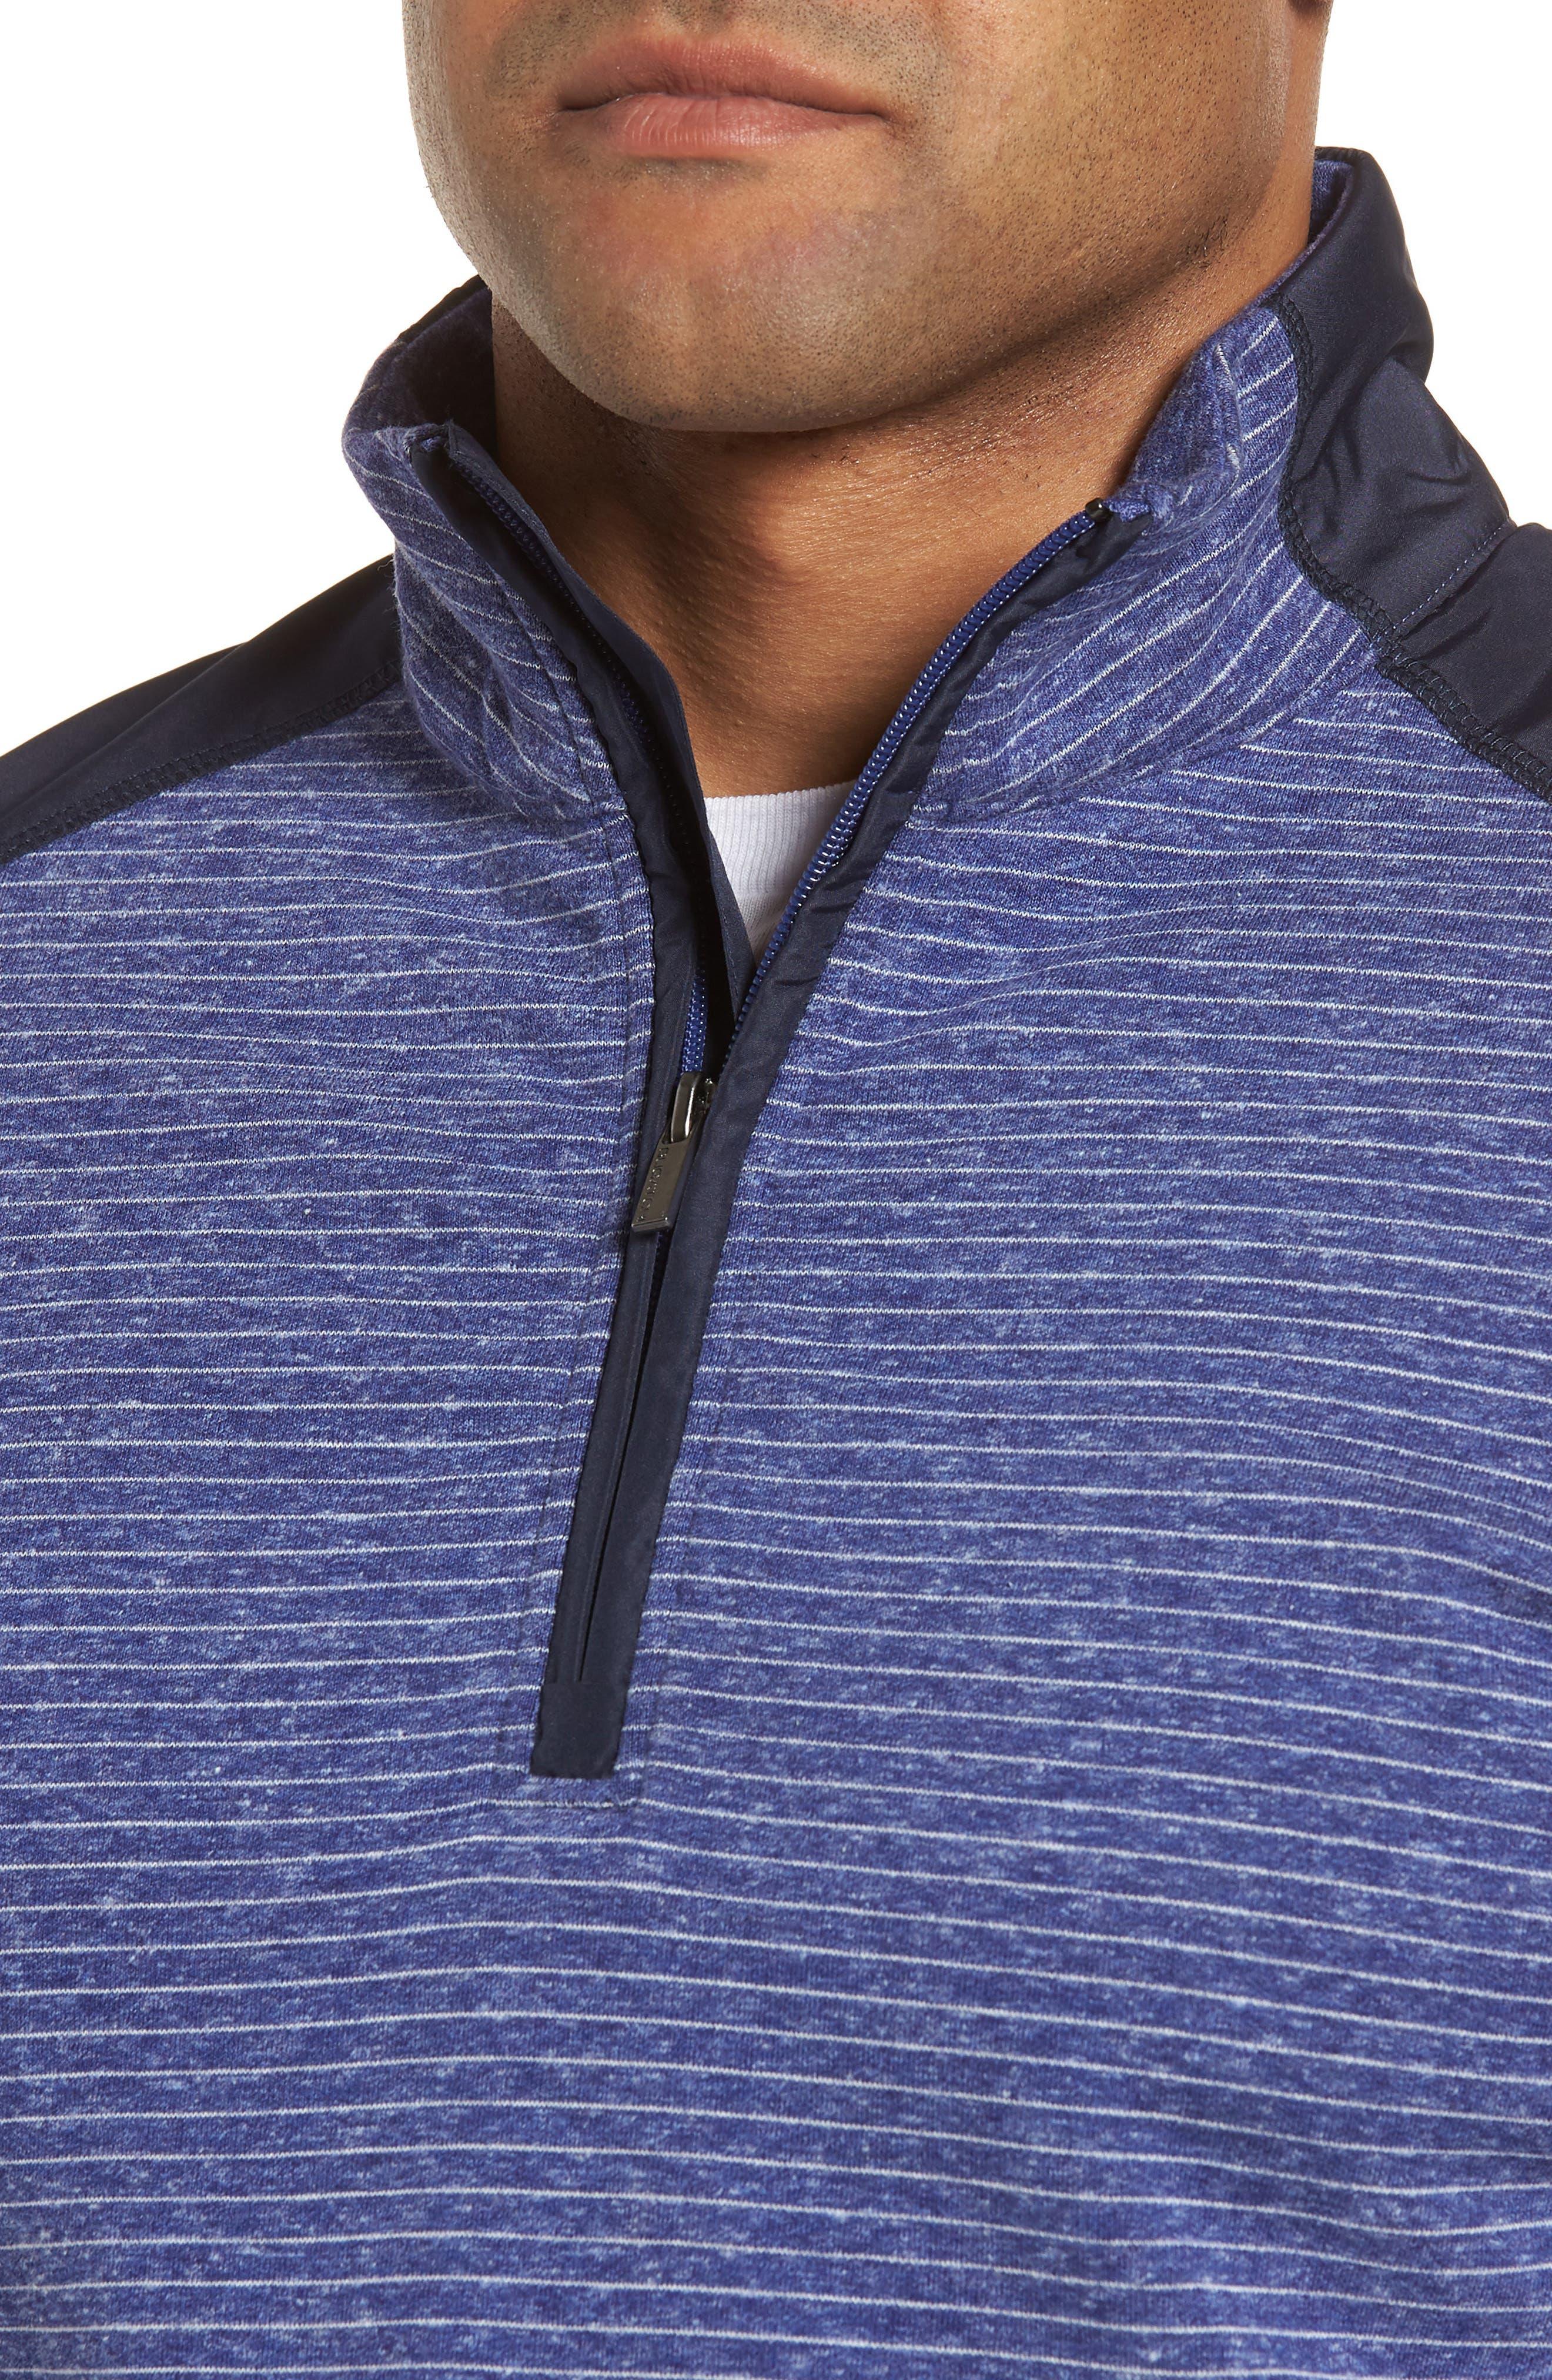 Regular Fit Stripe Quarter Zip Pullover,                             Alternate thumbnail 4, color,                             Night Blue